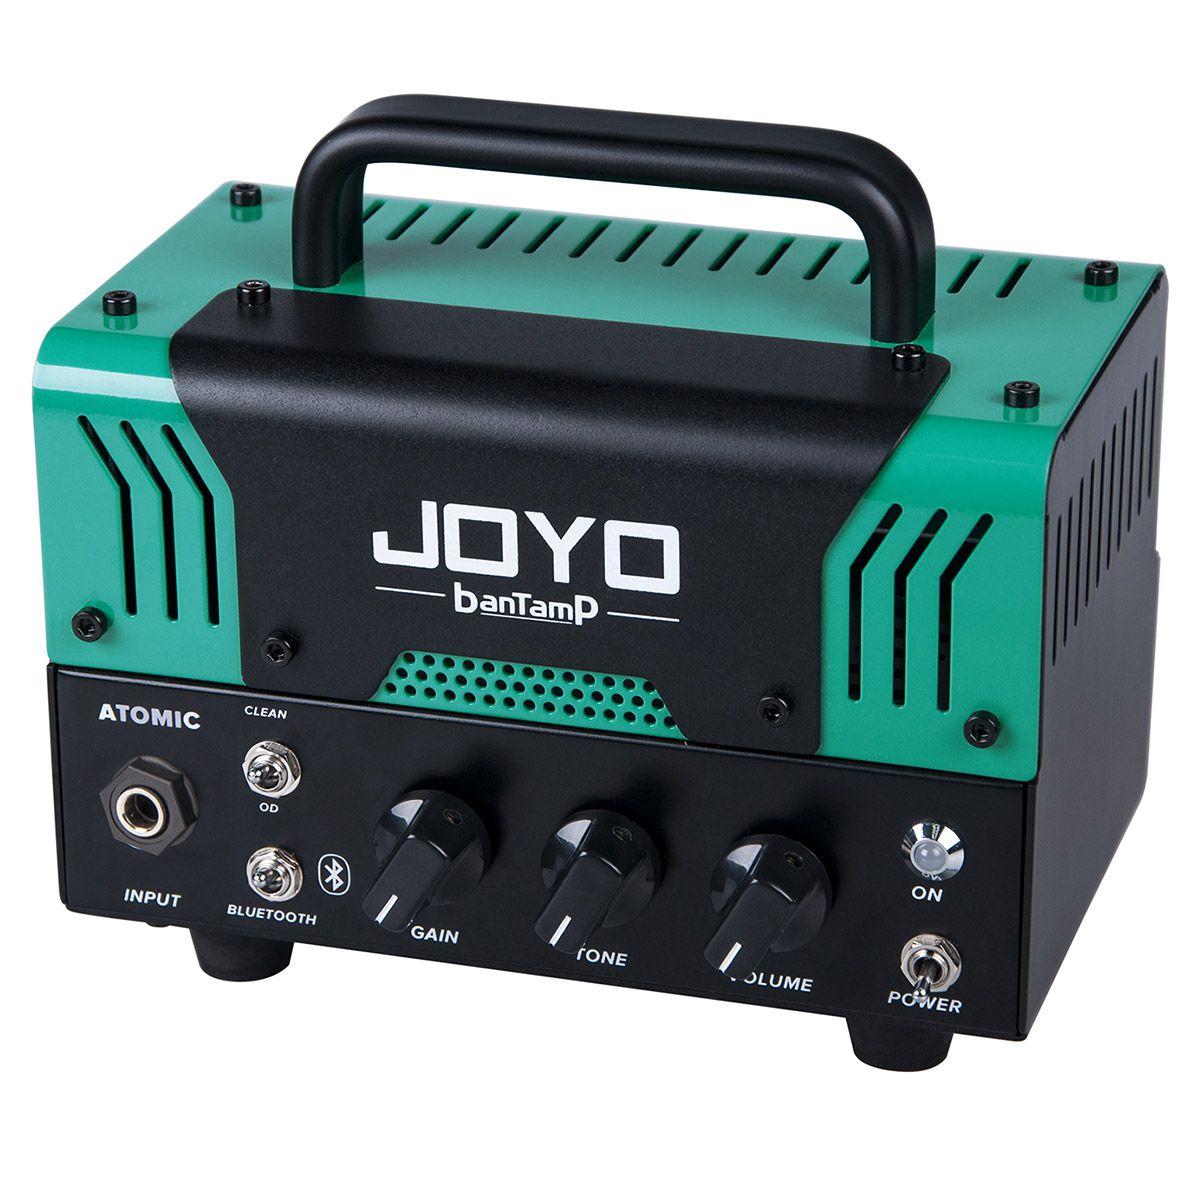 Mini Amplificador Joyo Atomic Bantamp 20w Para Guitarra